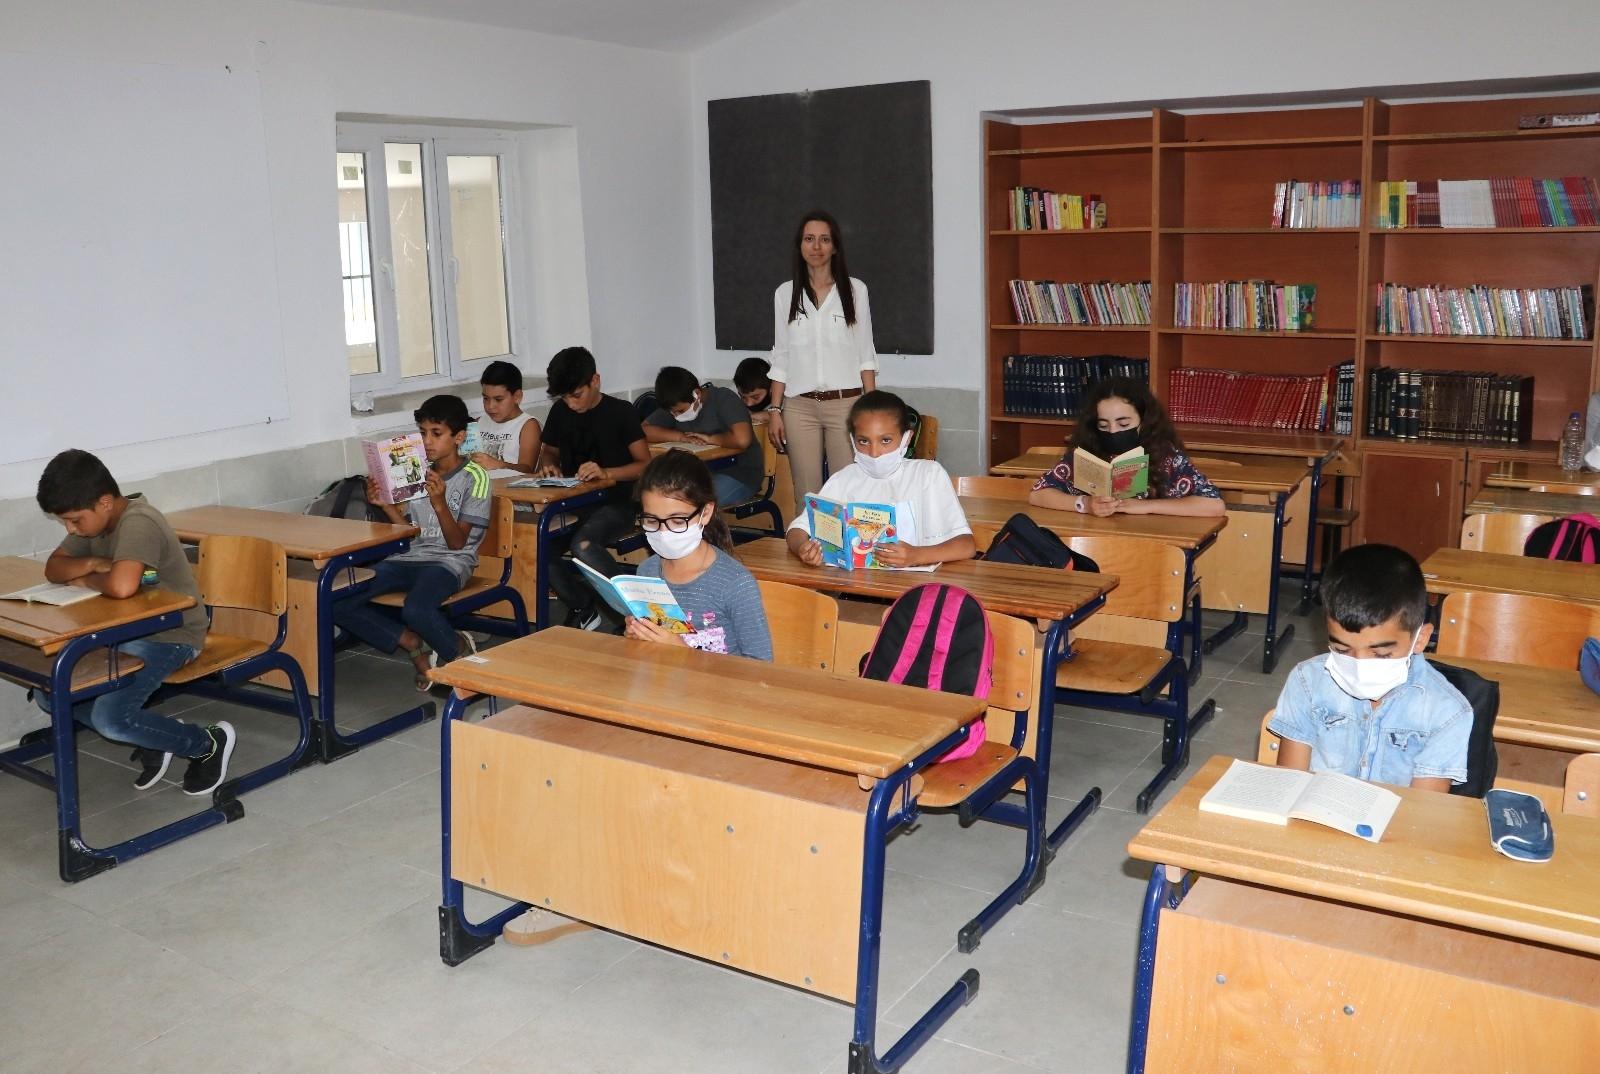 2021/06/okul-mudiresi-atandigi-harabe-koy-okuluna-adeta-hayat-verdi-20210610AW34-18.jpg